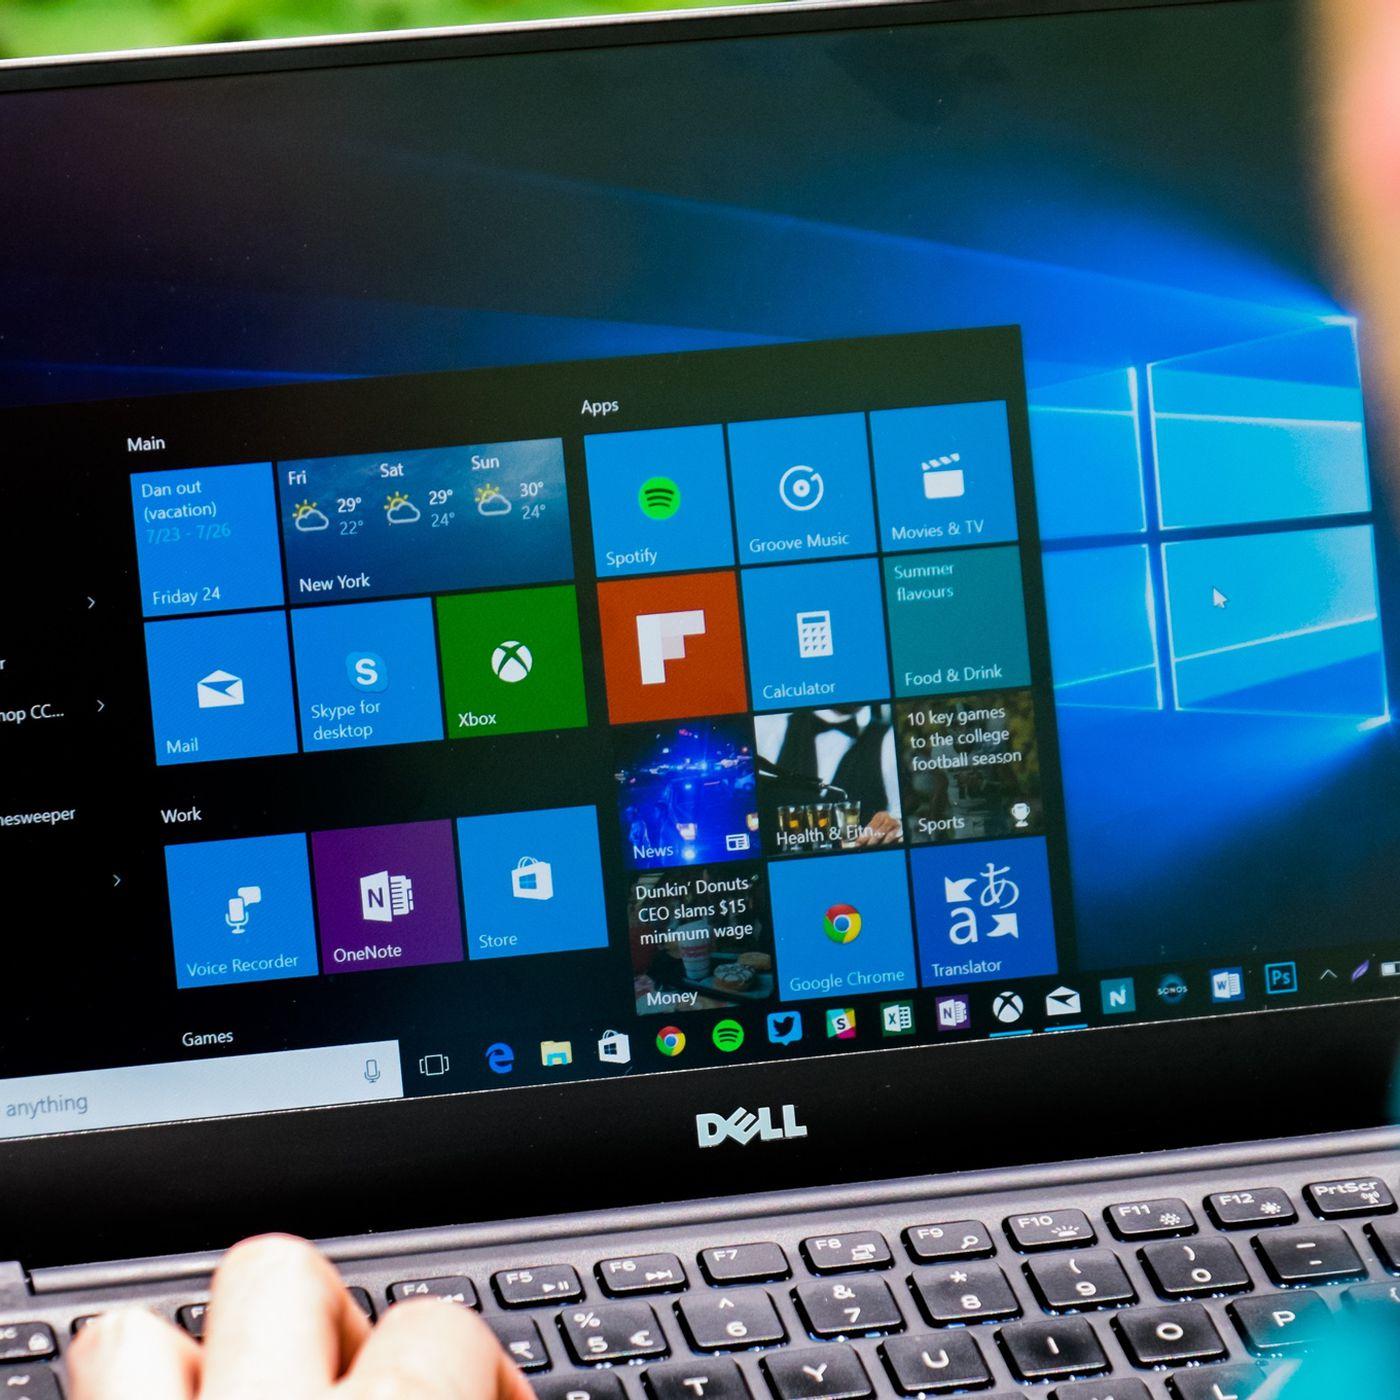 Windows 10's mail app gets Focused Inbox and calendar improvements